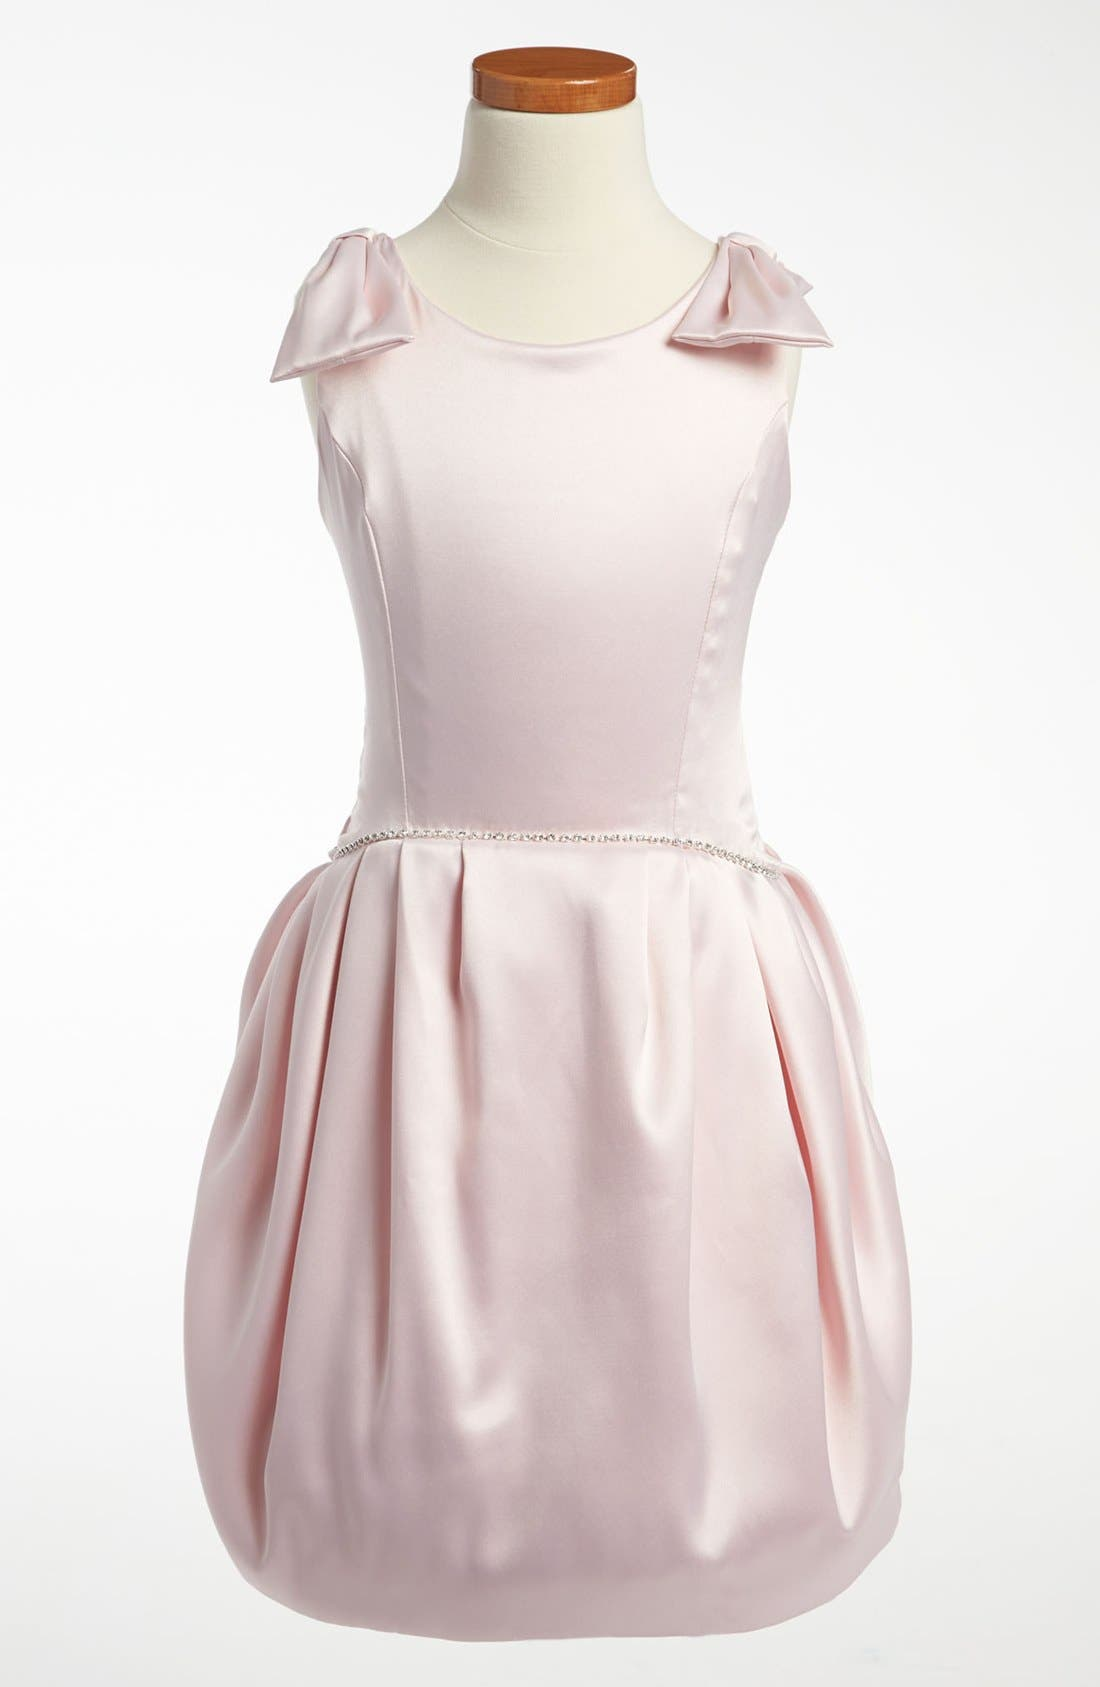 Main Image - La Piccola Danza Kidswear Satin Pleated Dress (Little Girls & Big Girls)